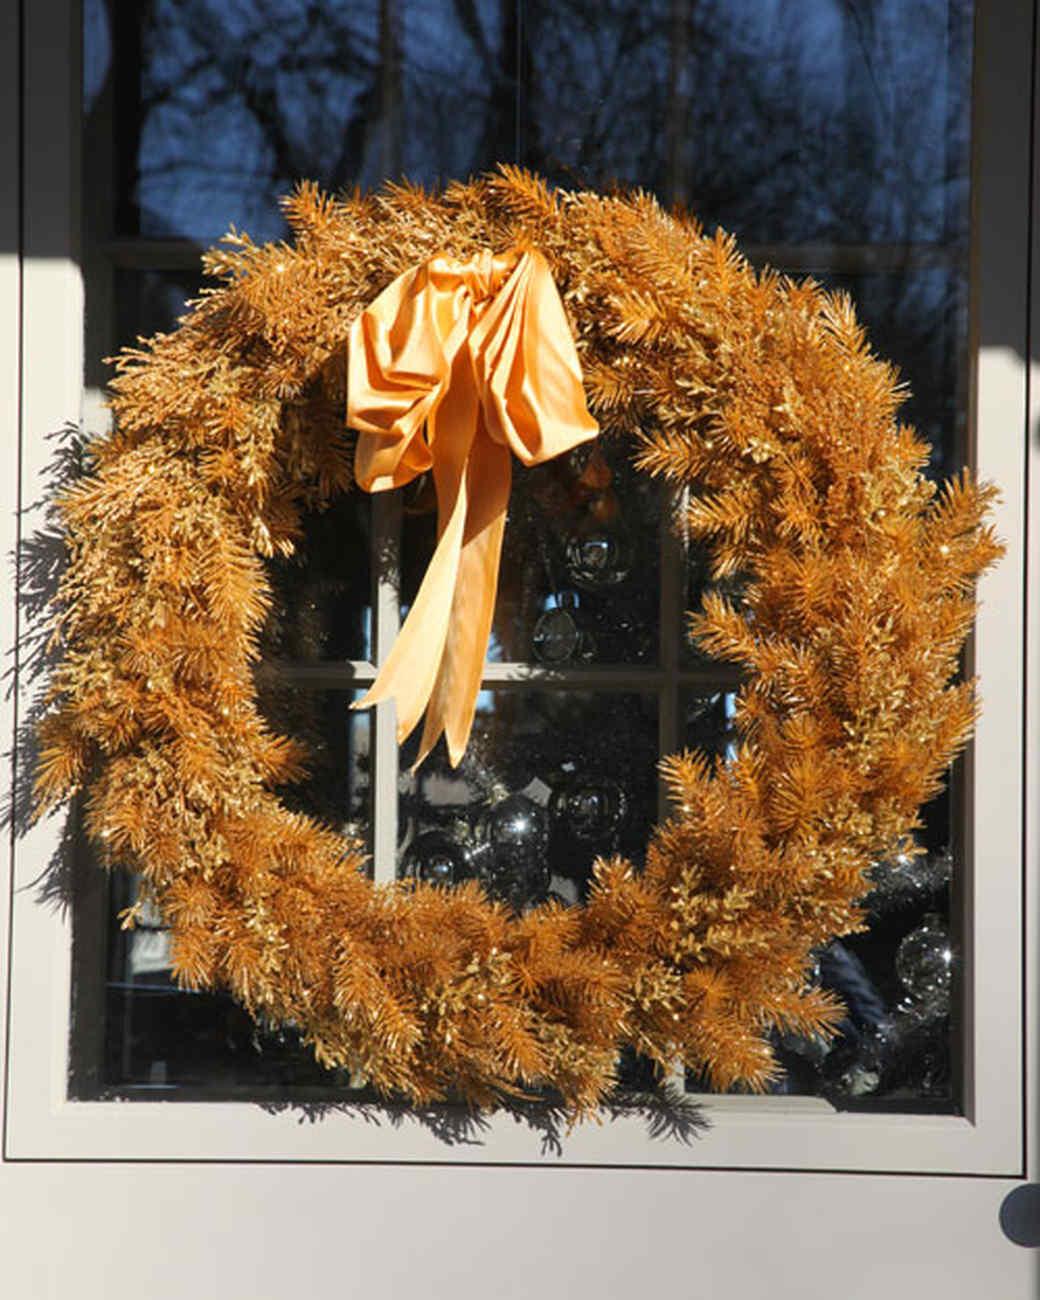 martha-christmas-2010-golden-wreath-1143.jpg